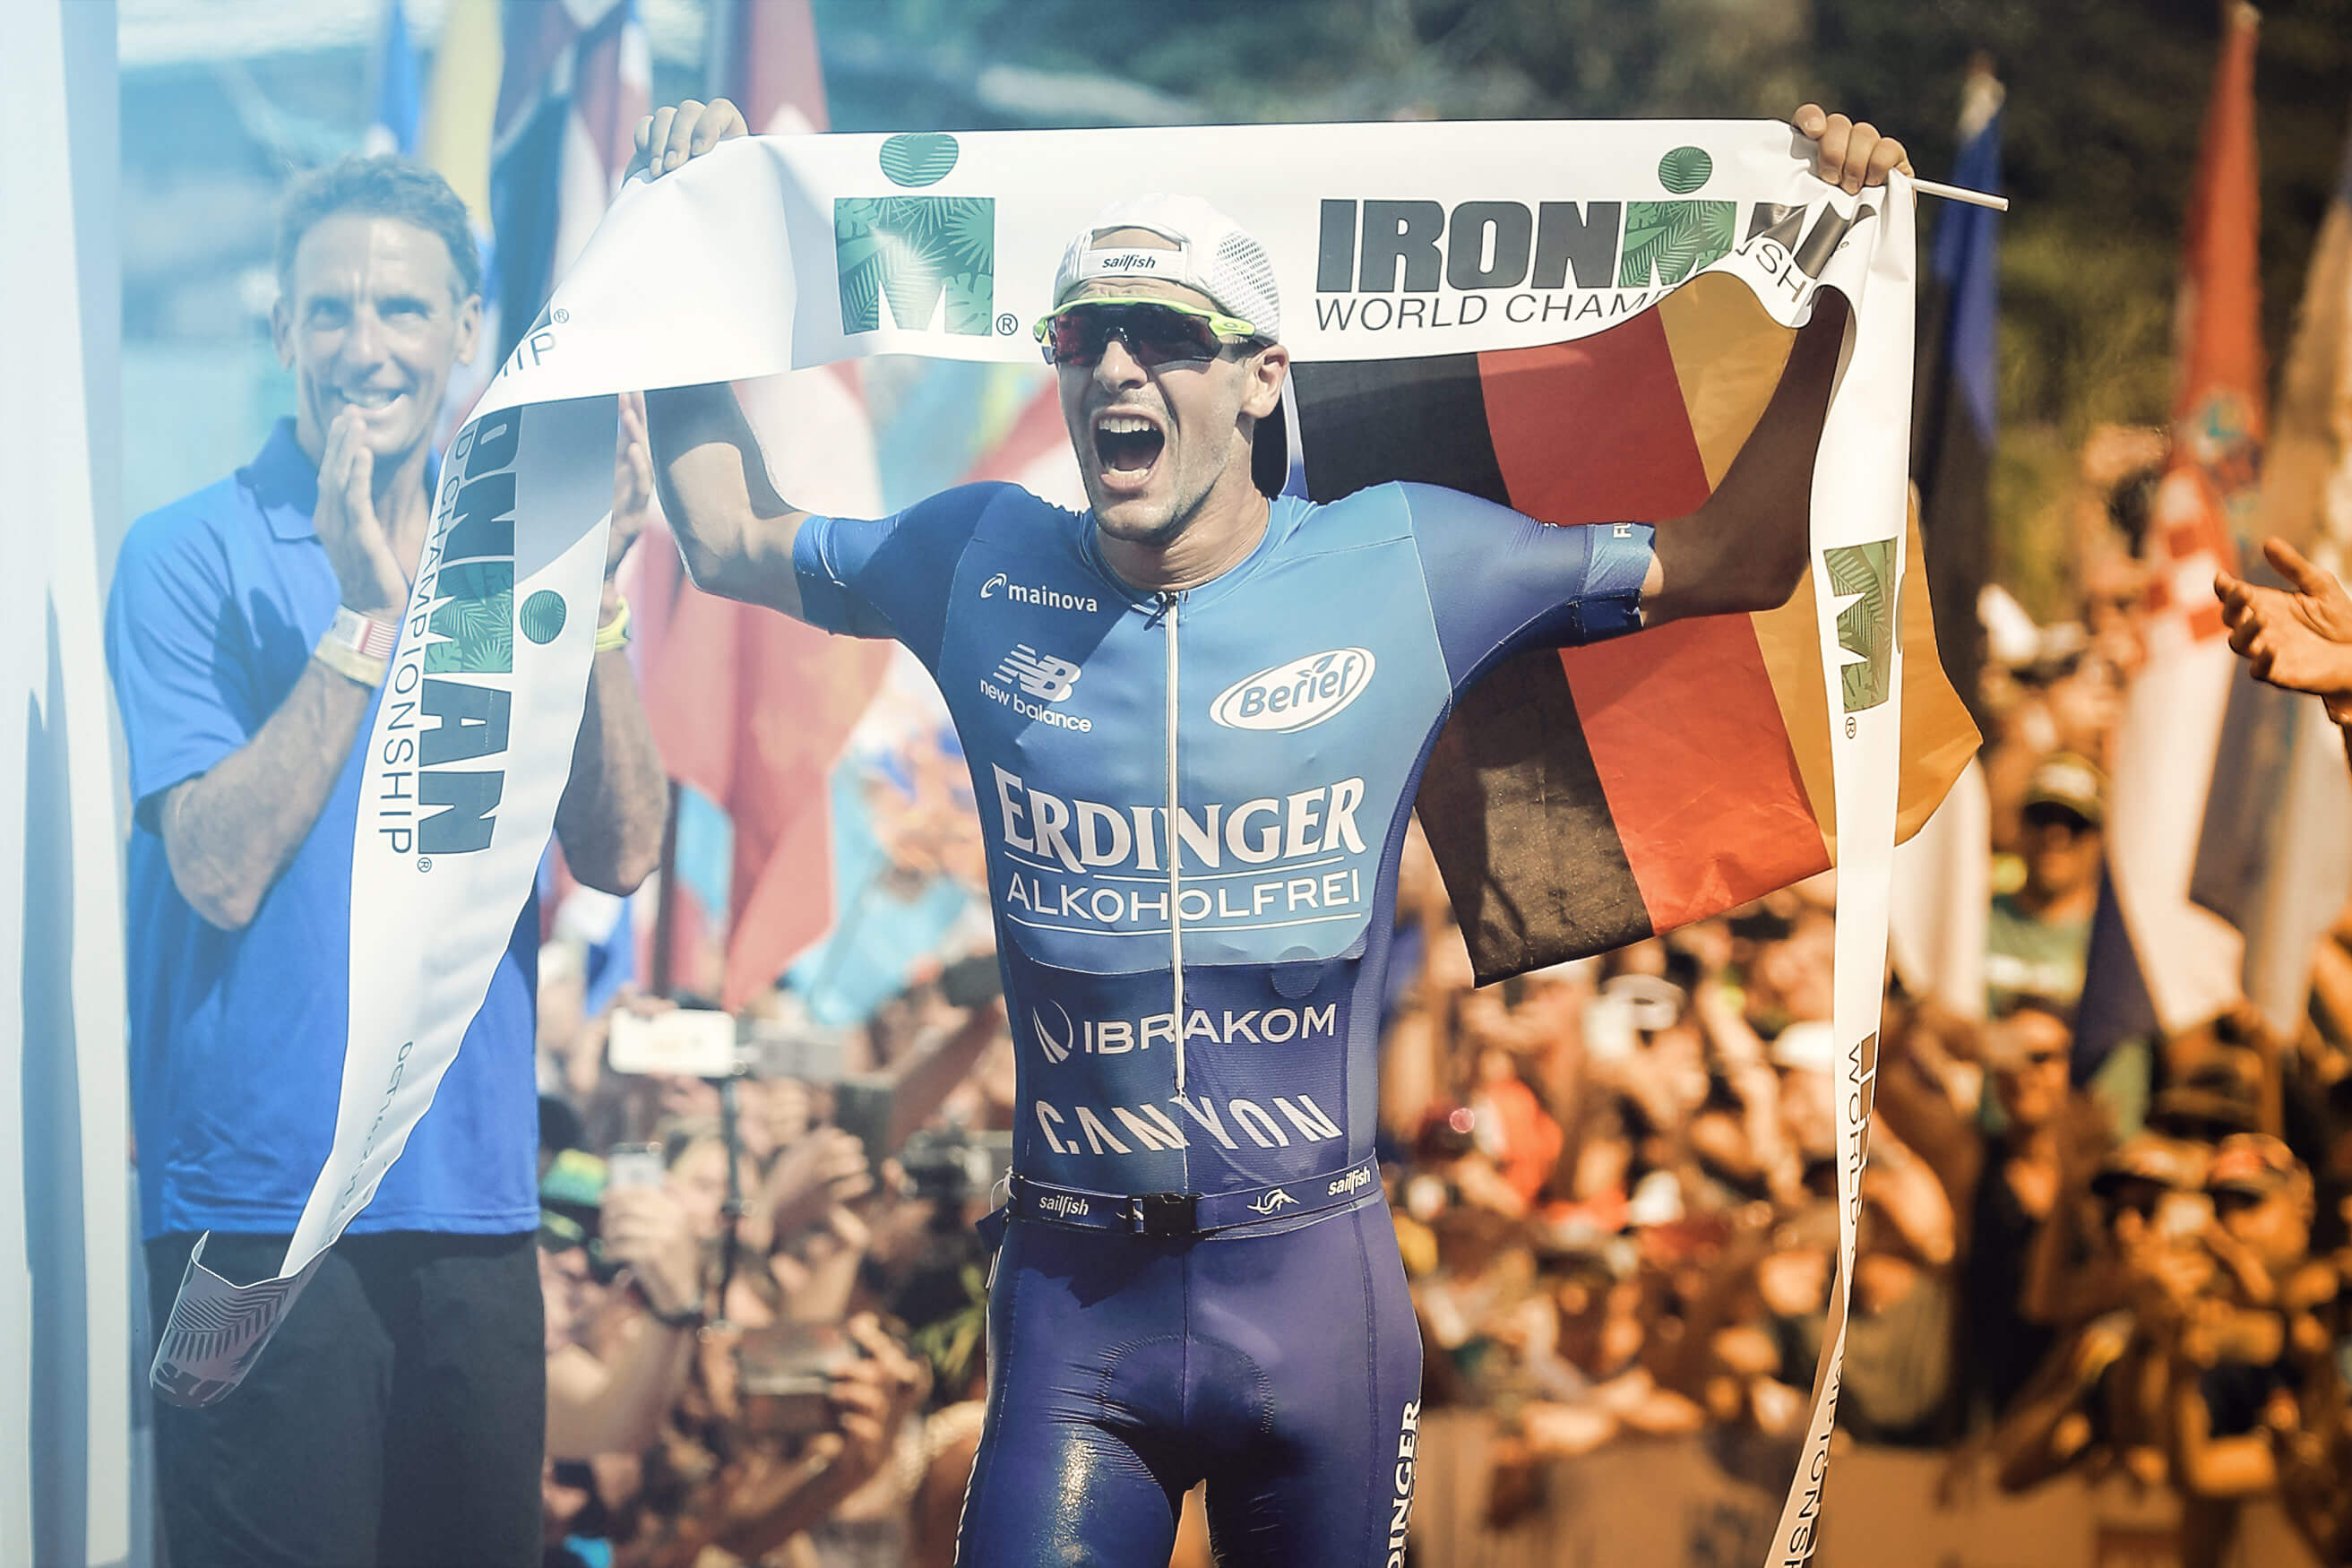 Patrick Lange Ironman Weltmeister 2017